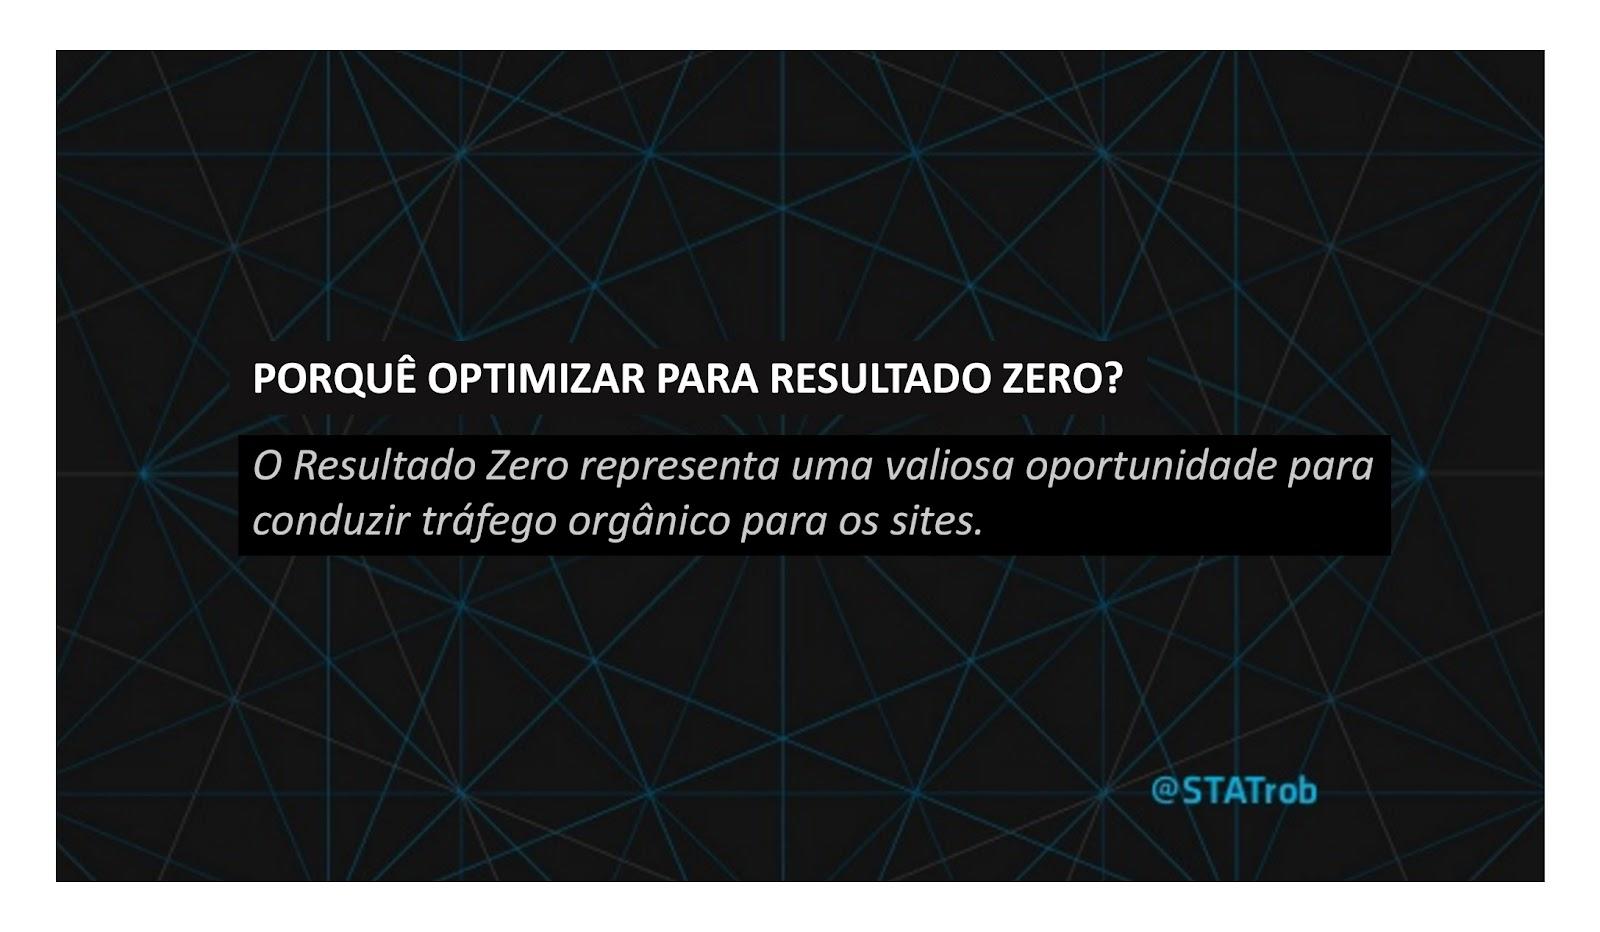 Optimizar Resultado Zero